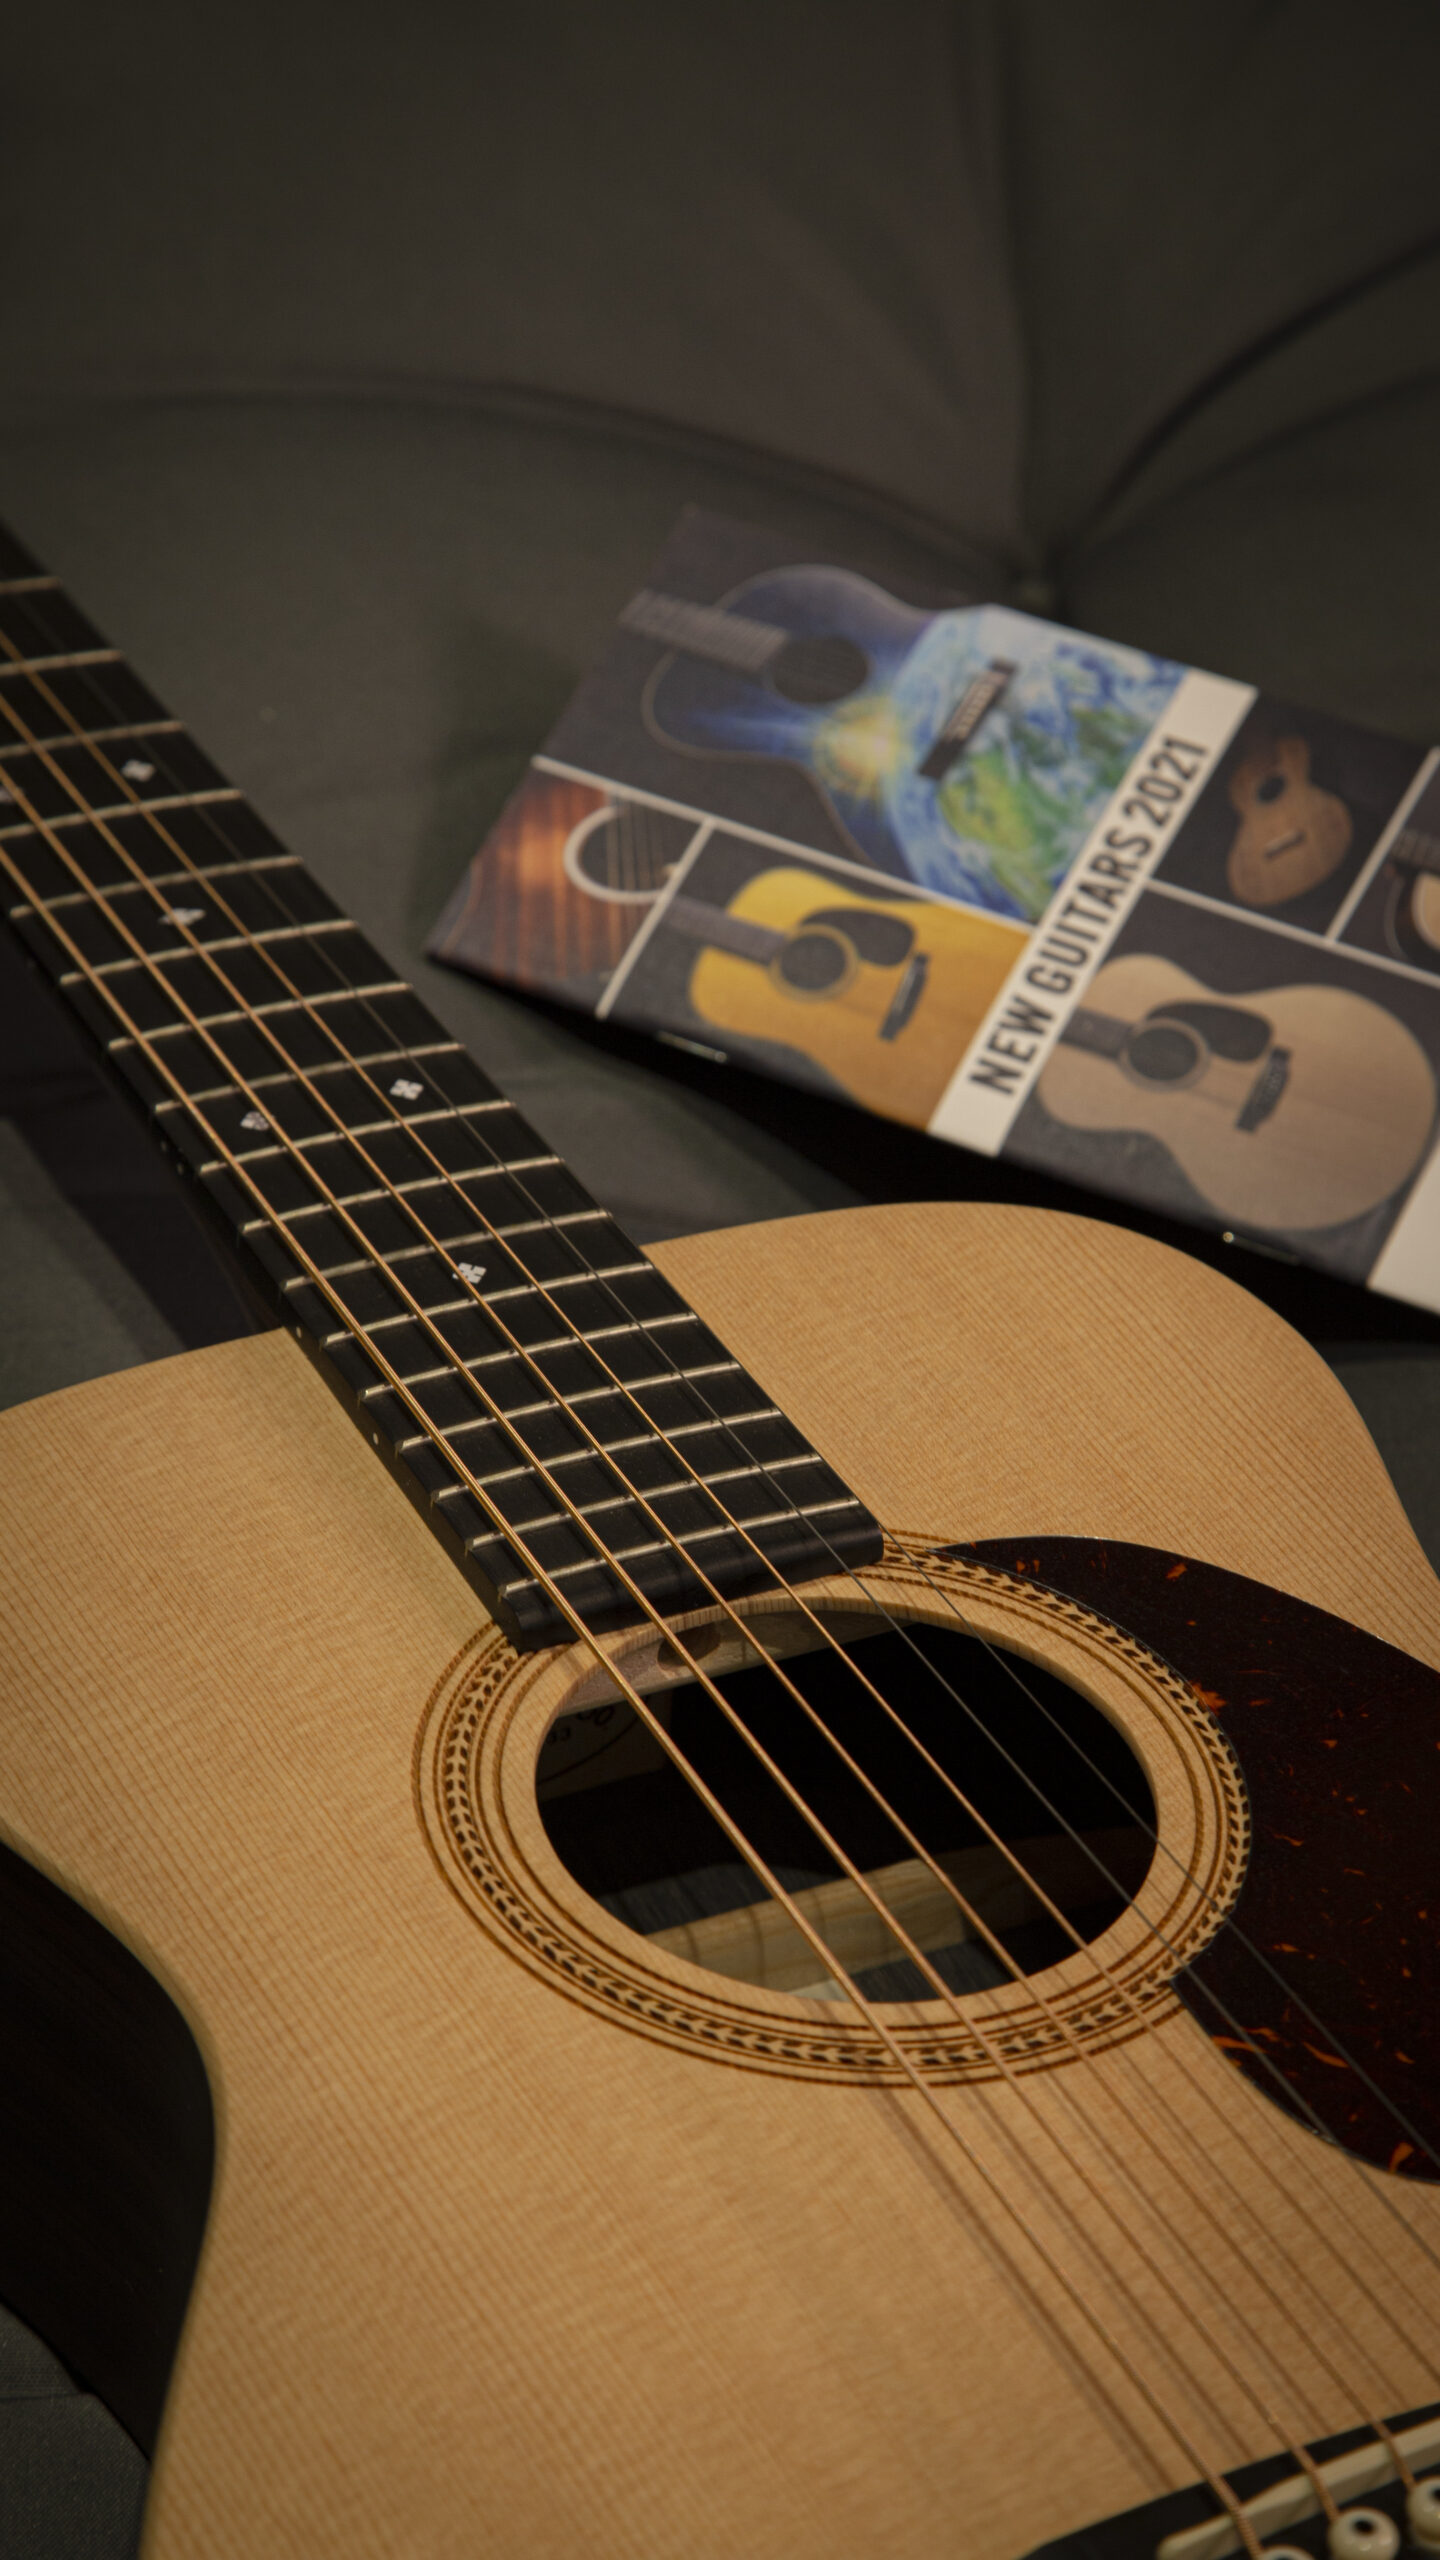 La Little Martin, une petite guitare conviviale et surprenante!